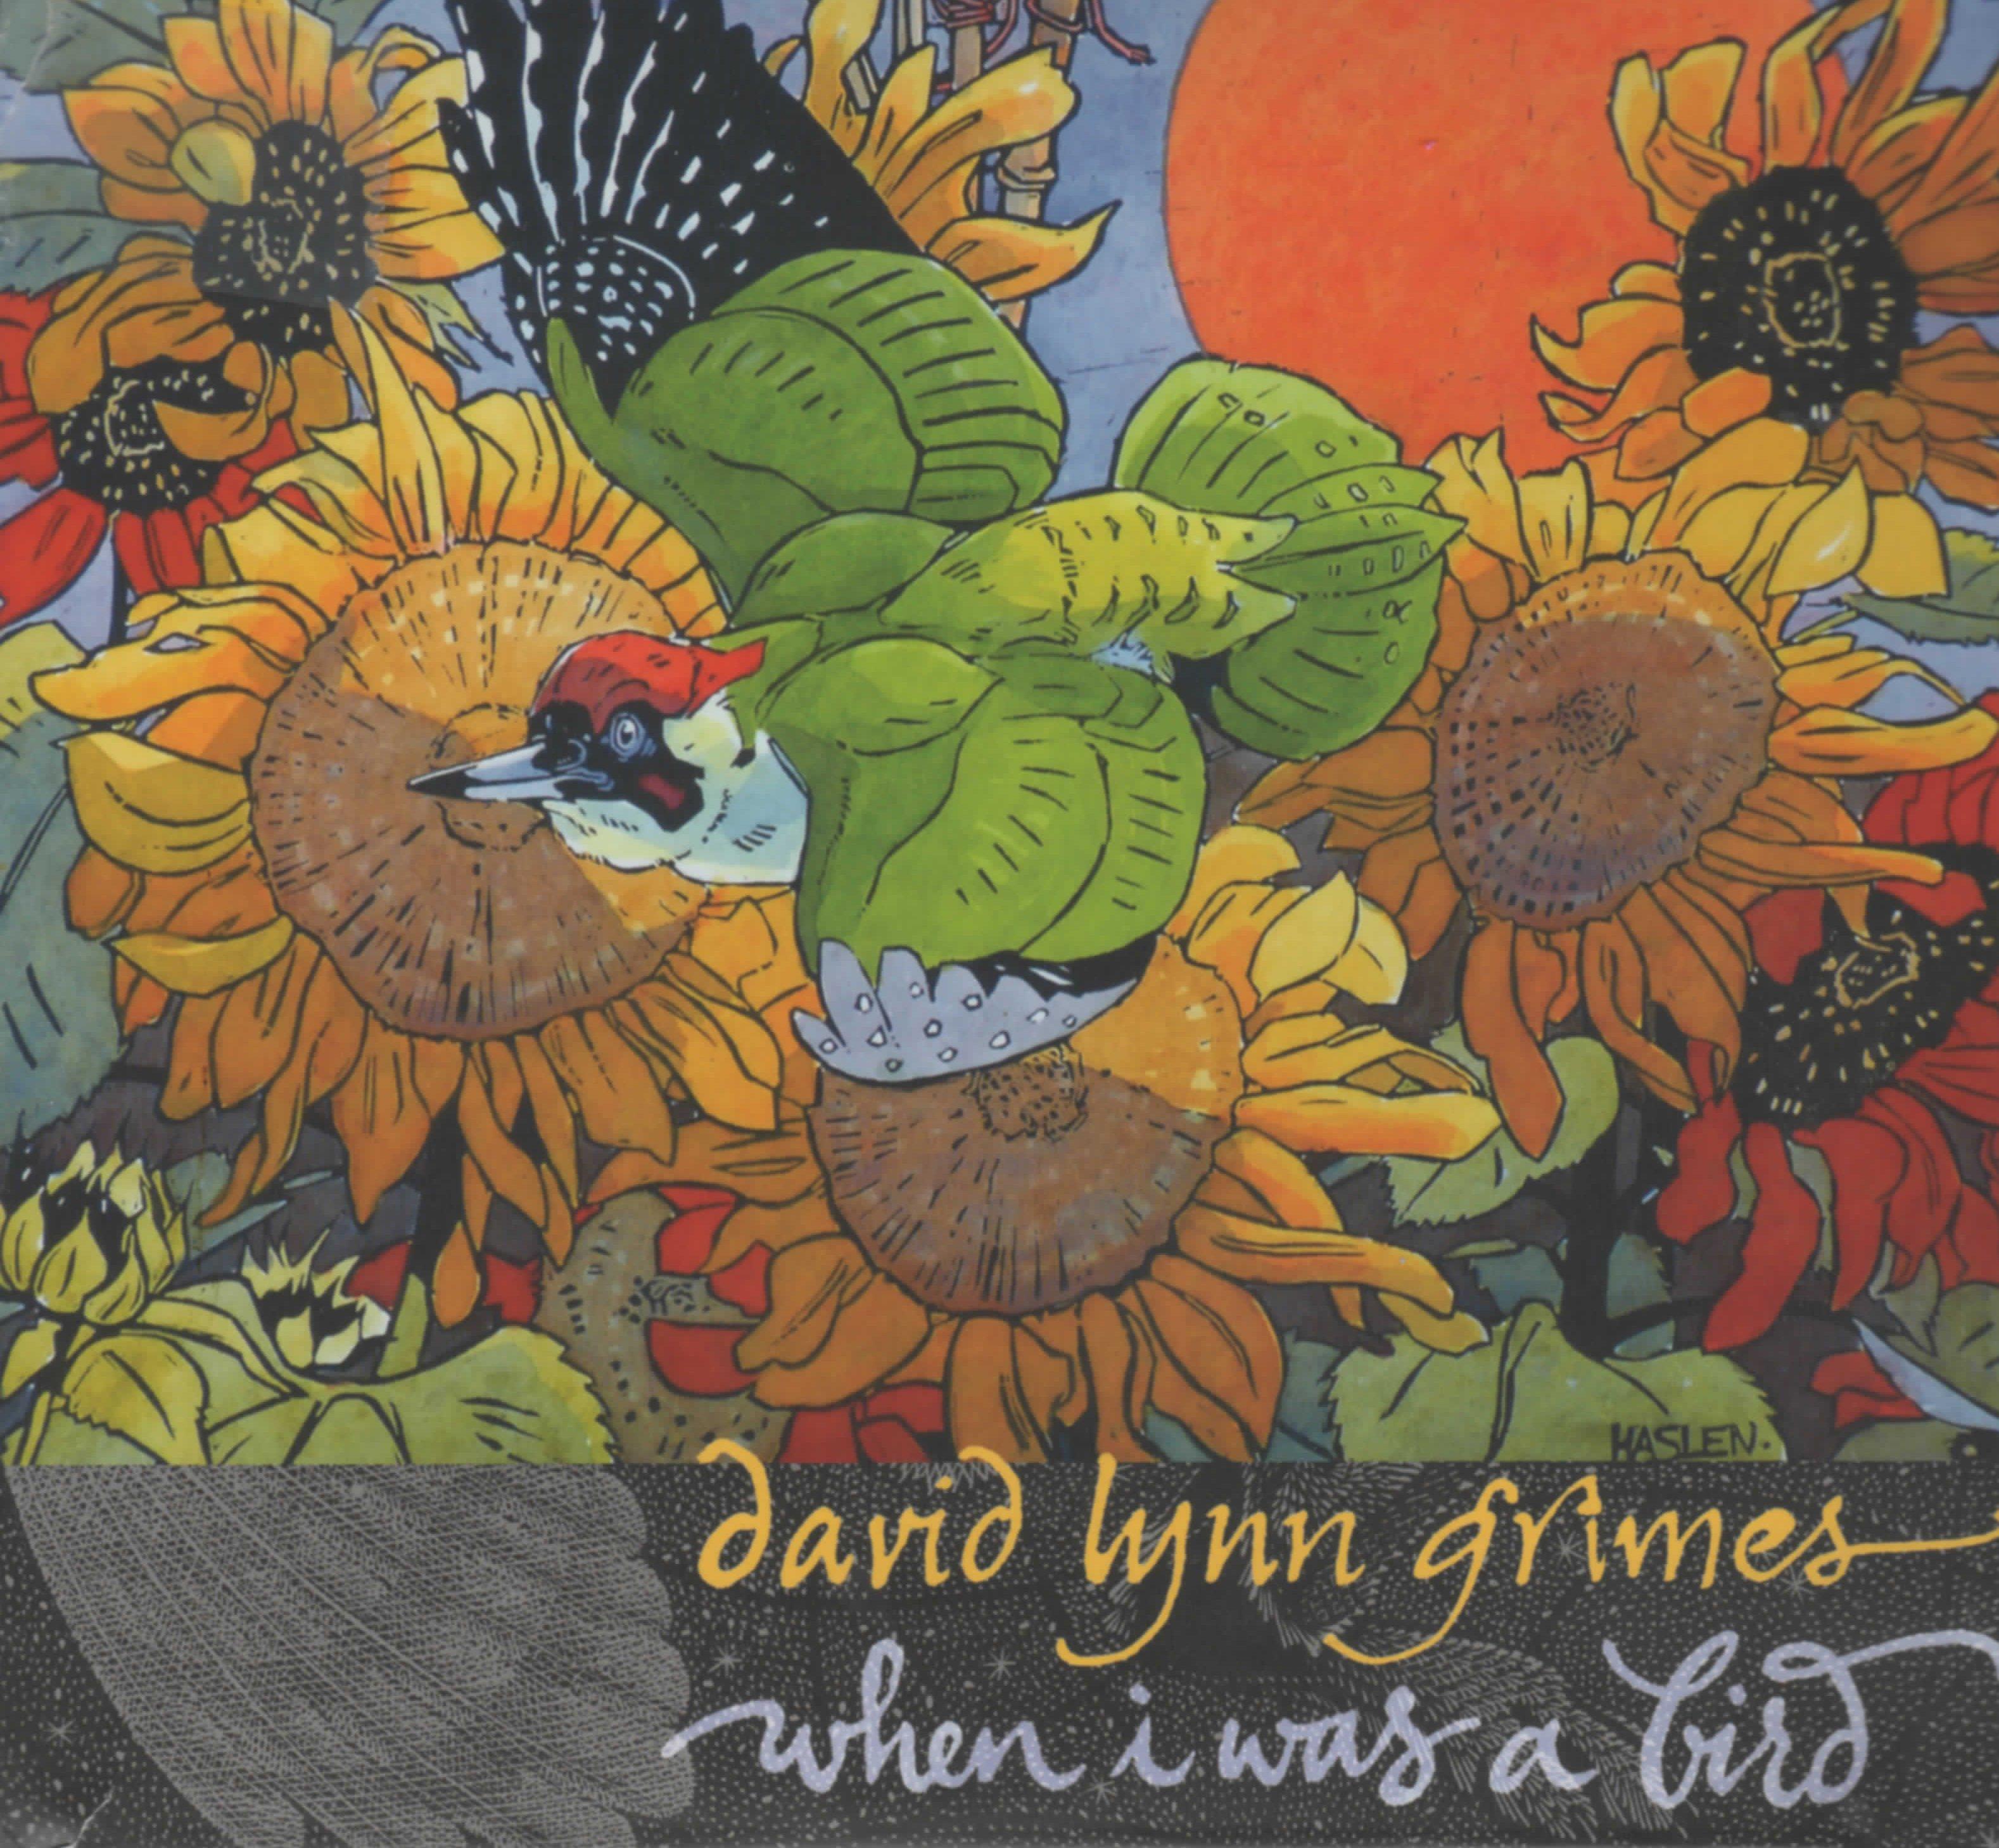 David Lynn Grimes Concert, 7:30PM